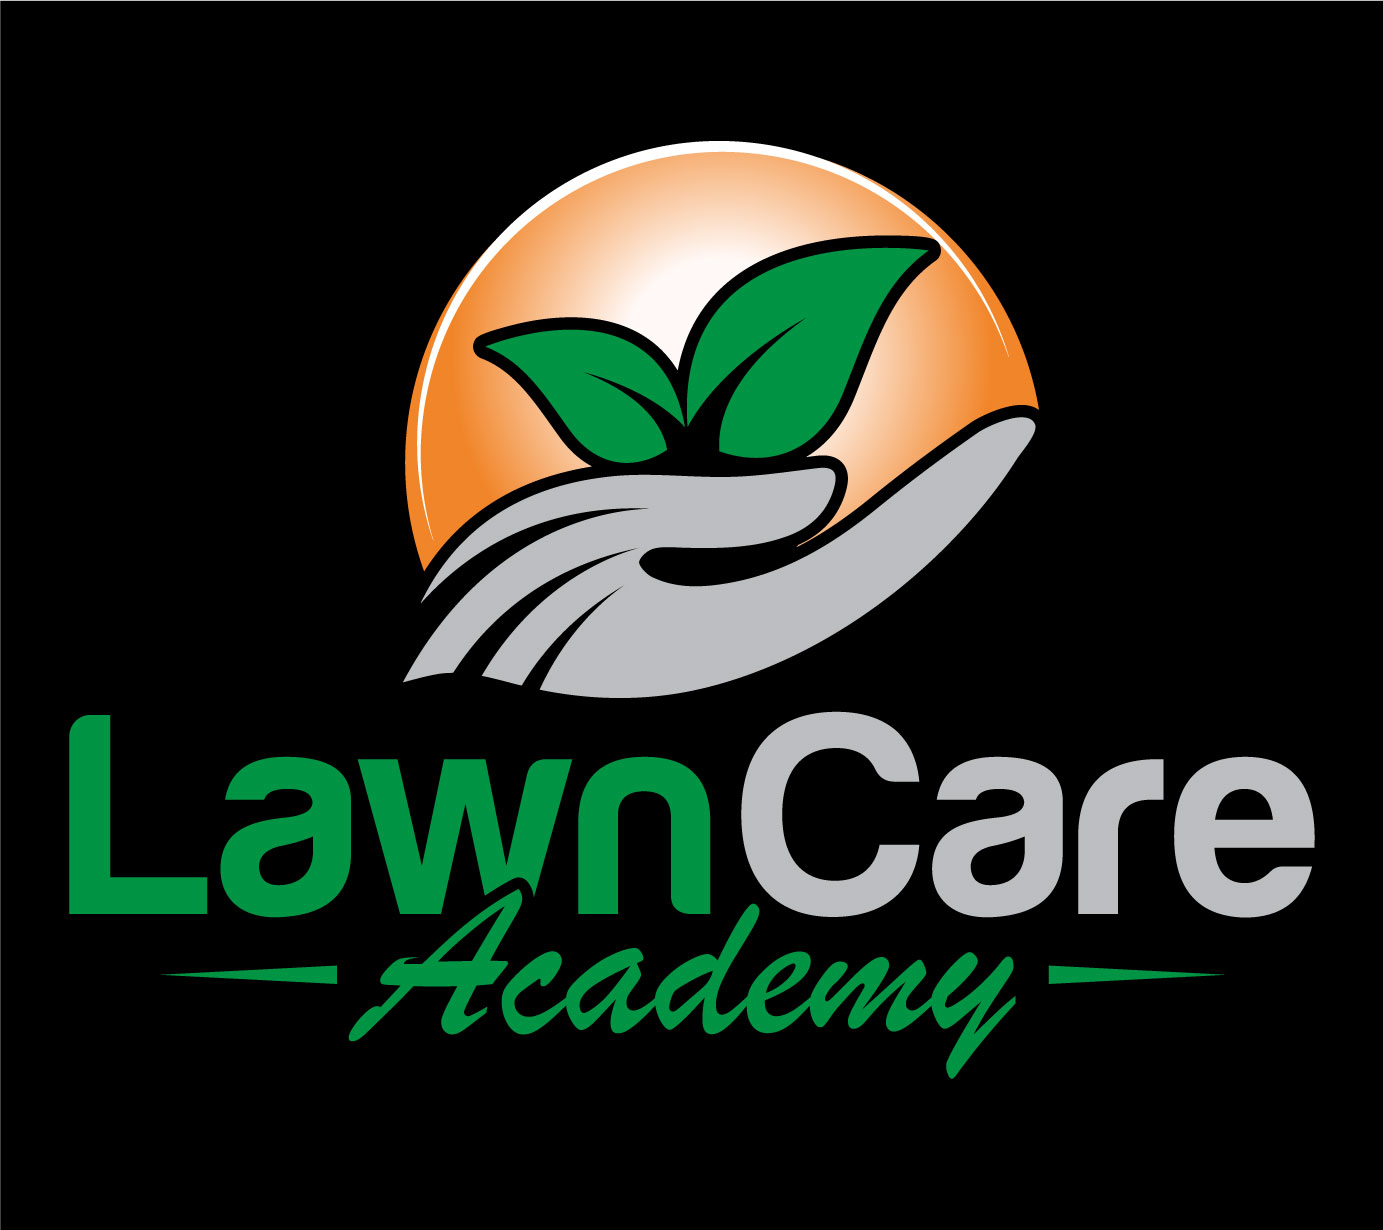 Lawn Care Academy Logo